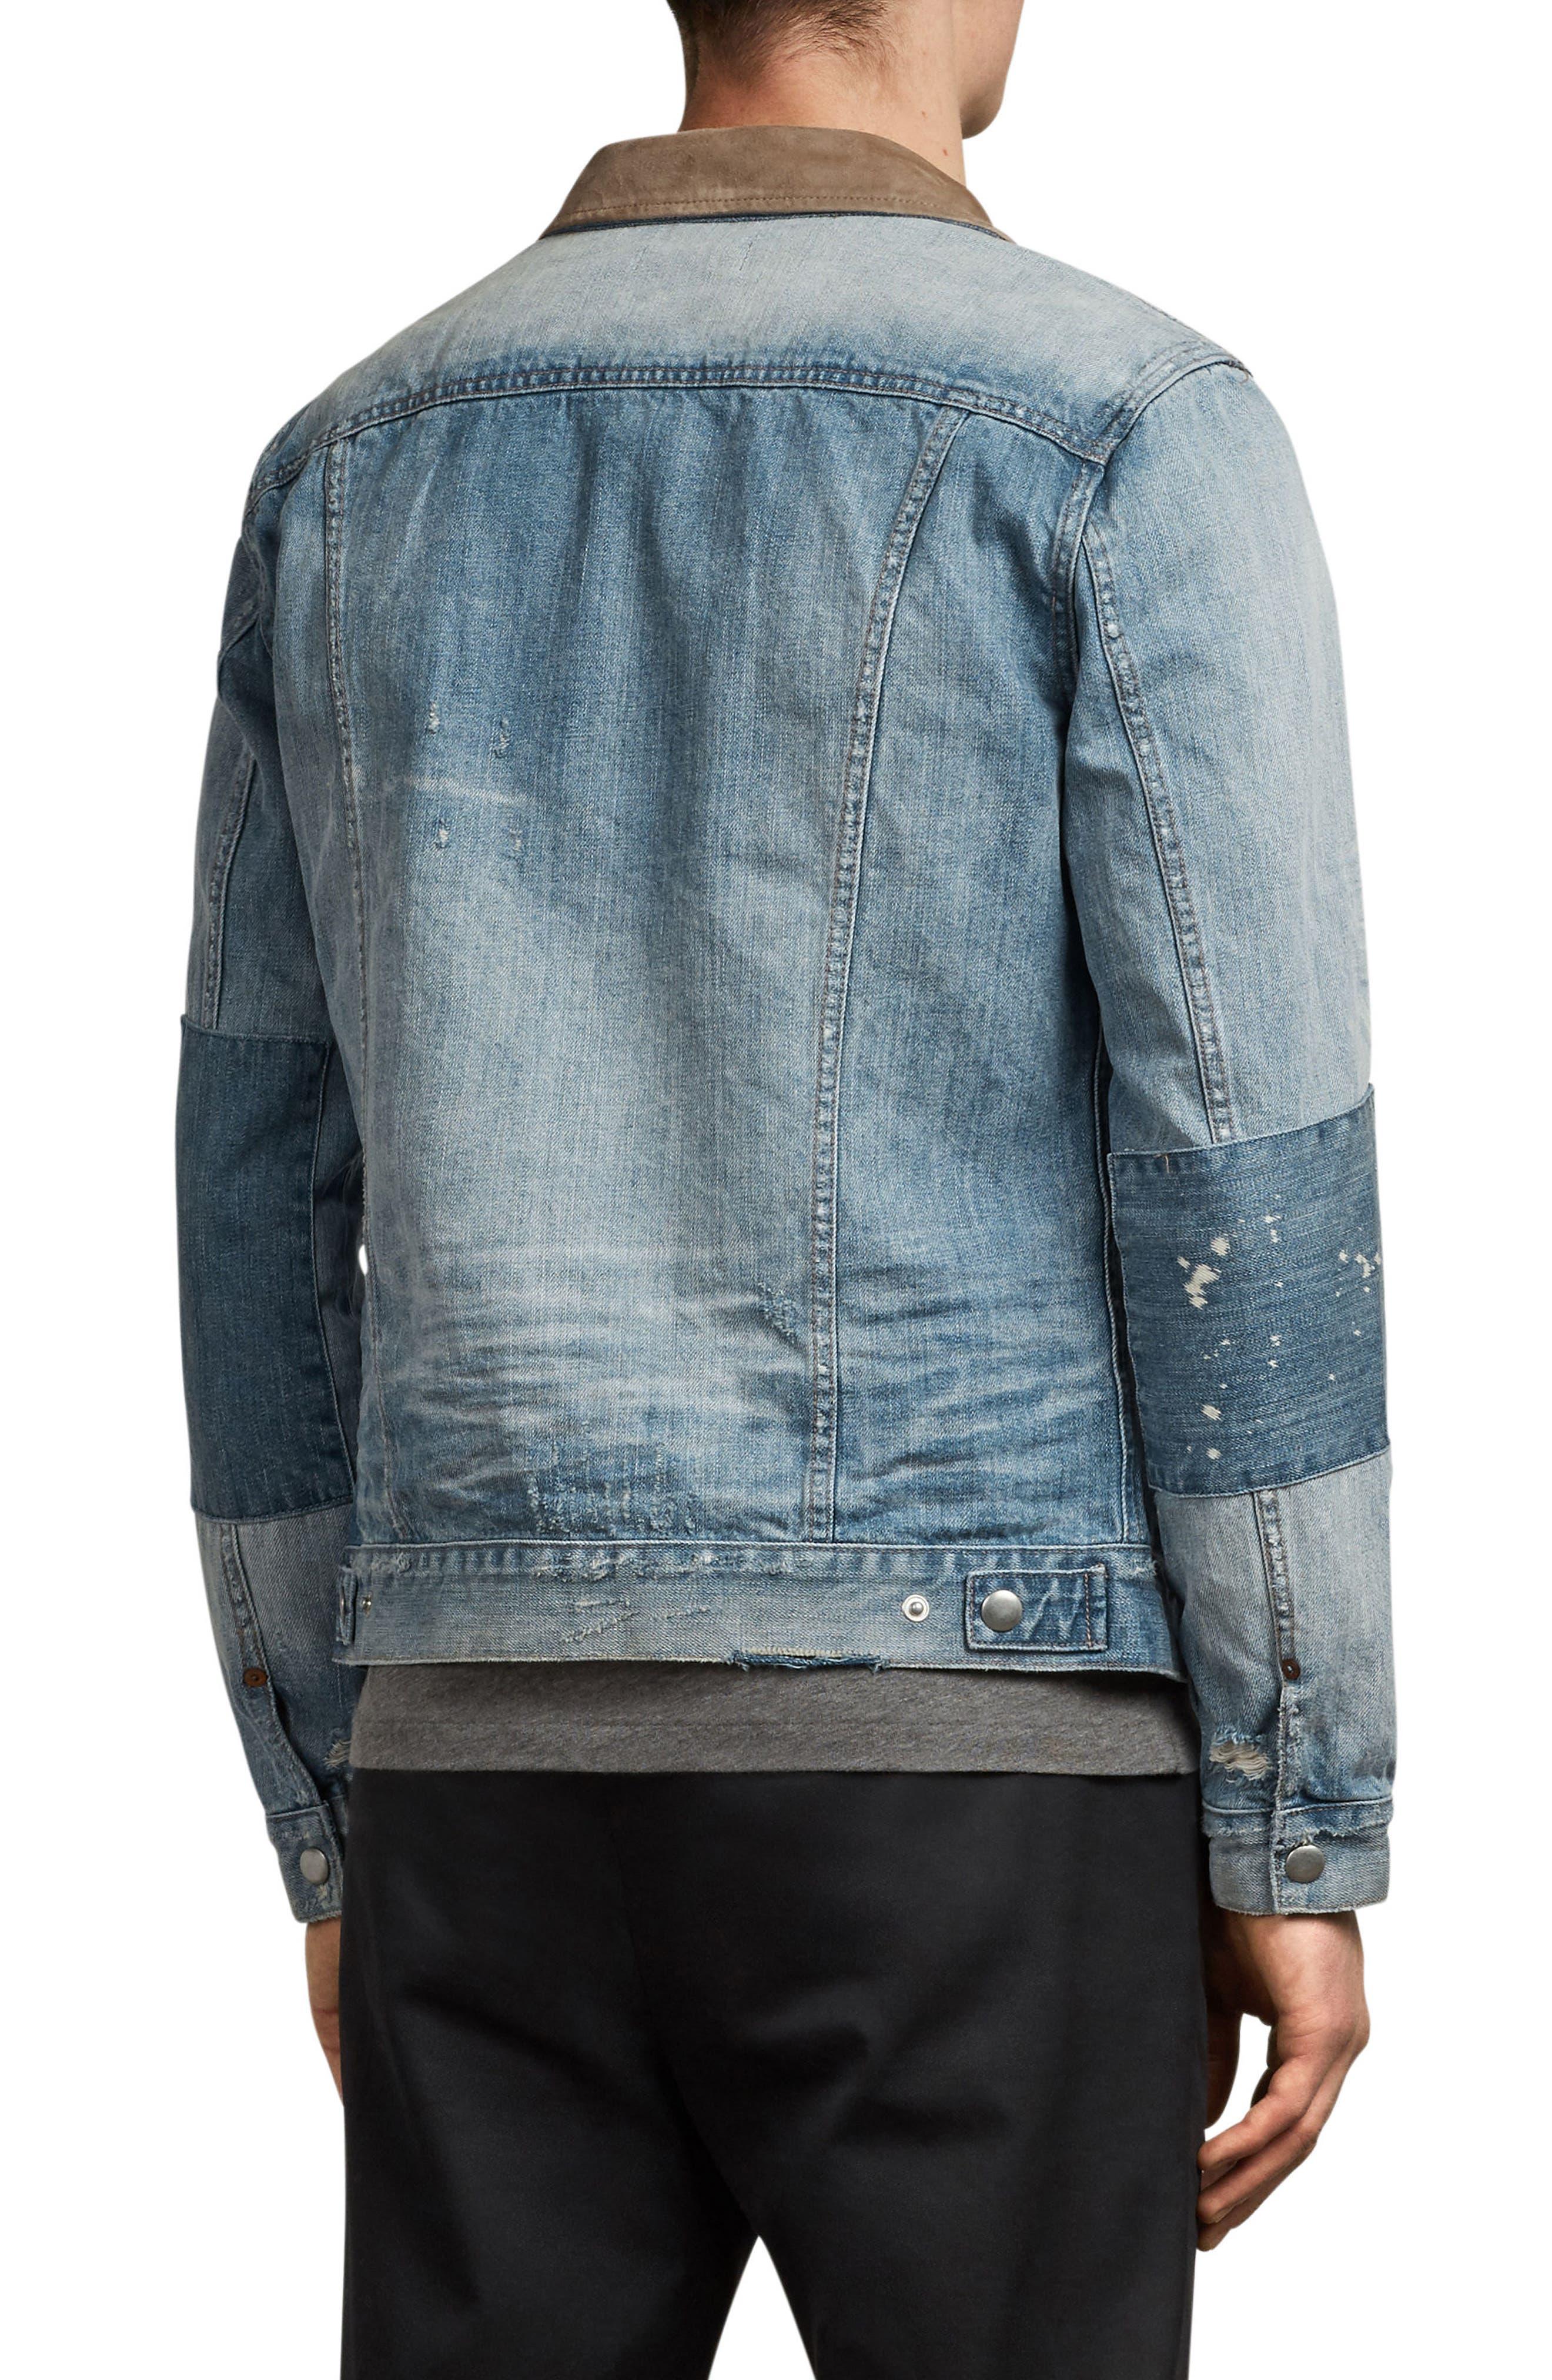 Ibanex Slim Fit Distressed Denim Jacket,                             Alternate thumbnail 2, color,                             Indigo